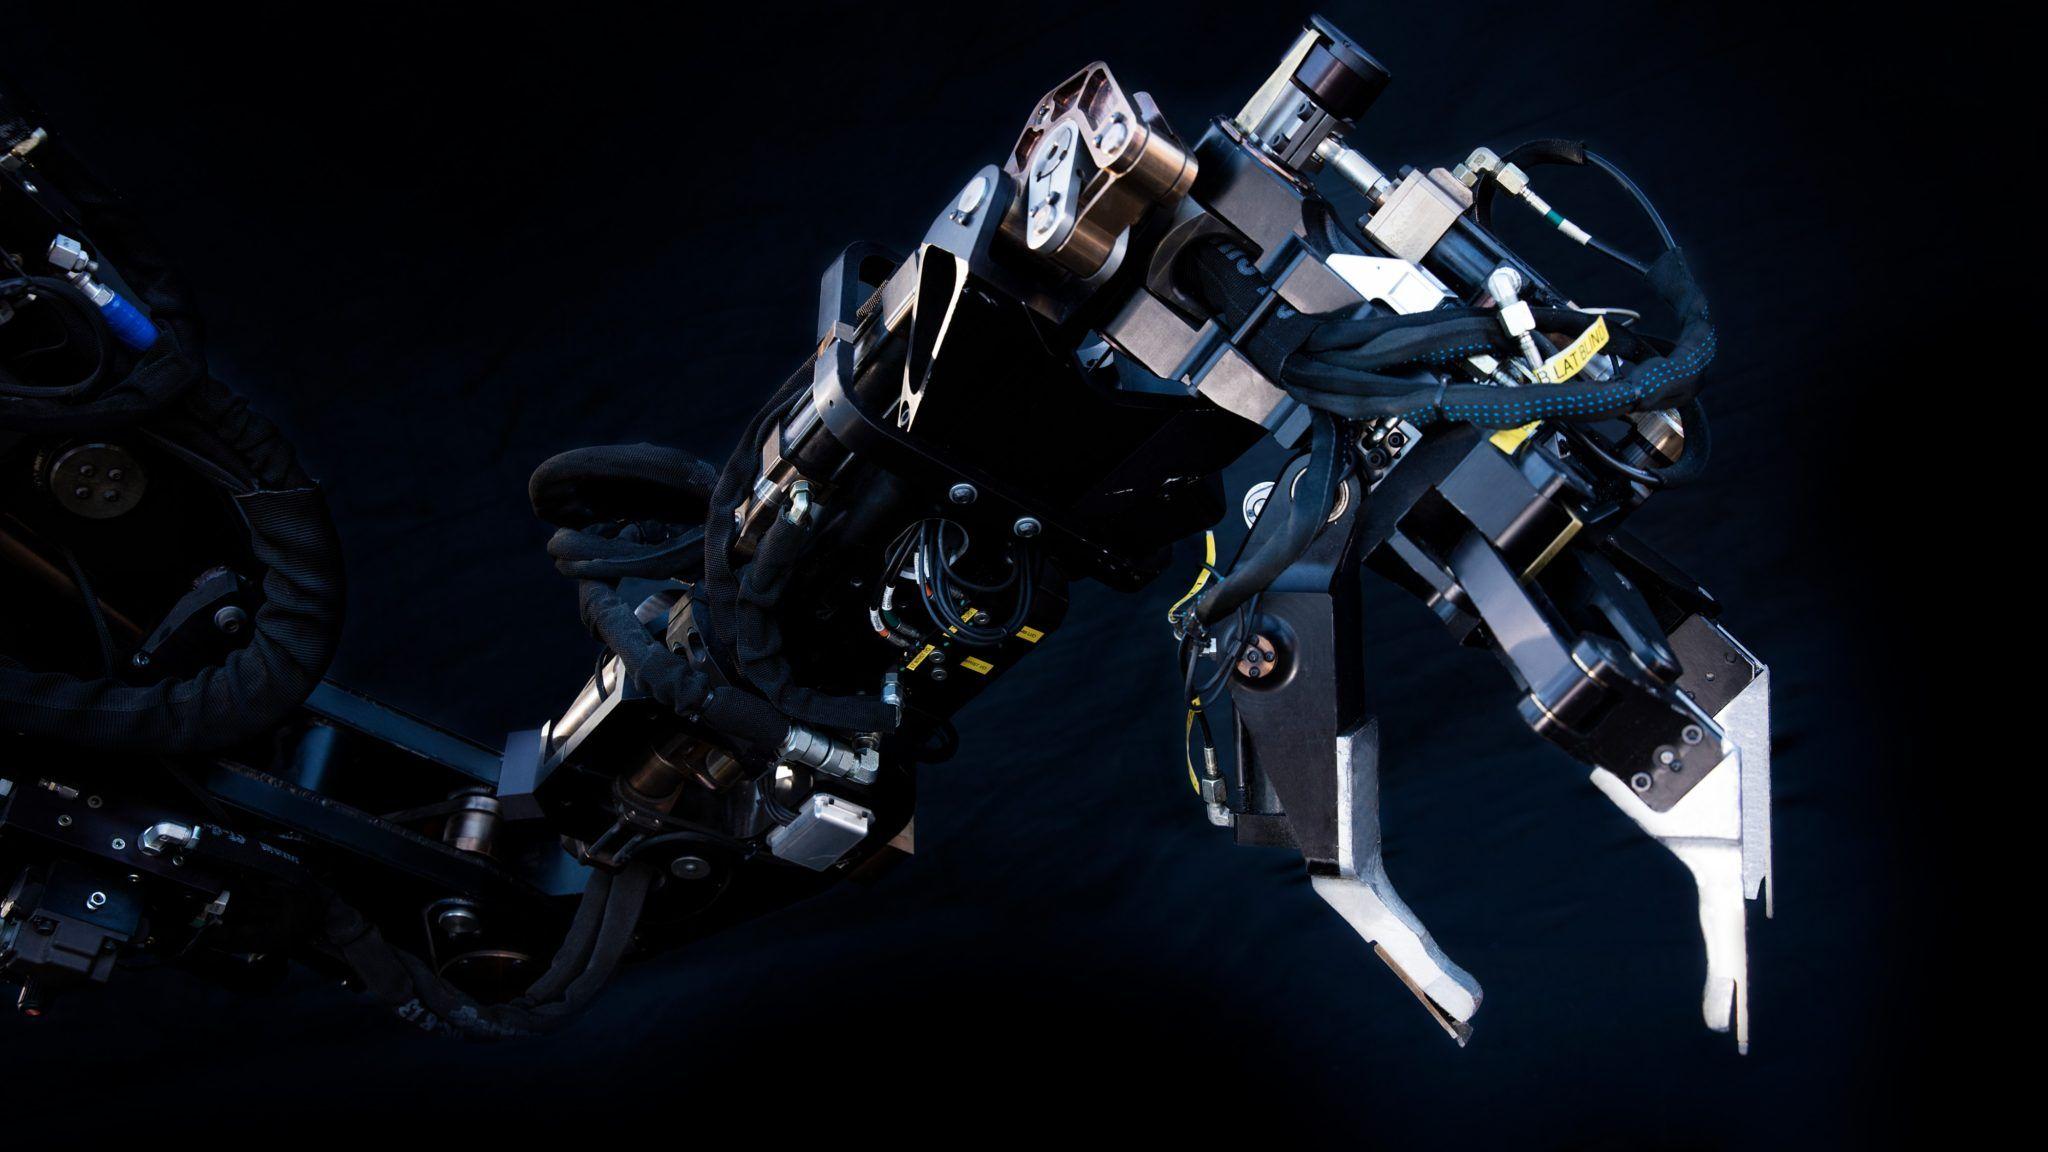 Sarcos GT's robotic arms can lift 1,000 pounds